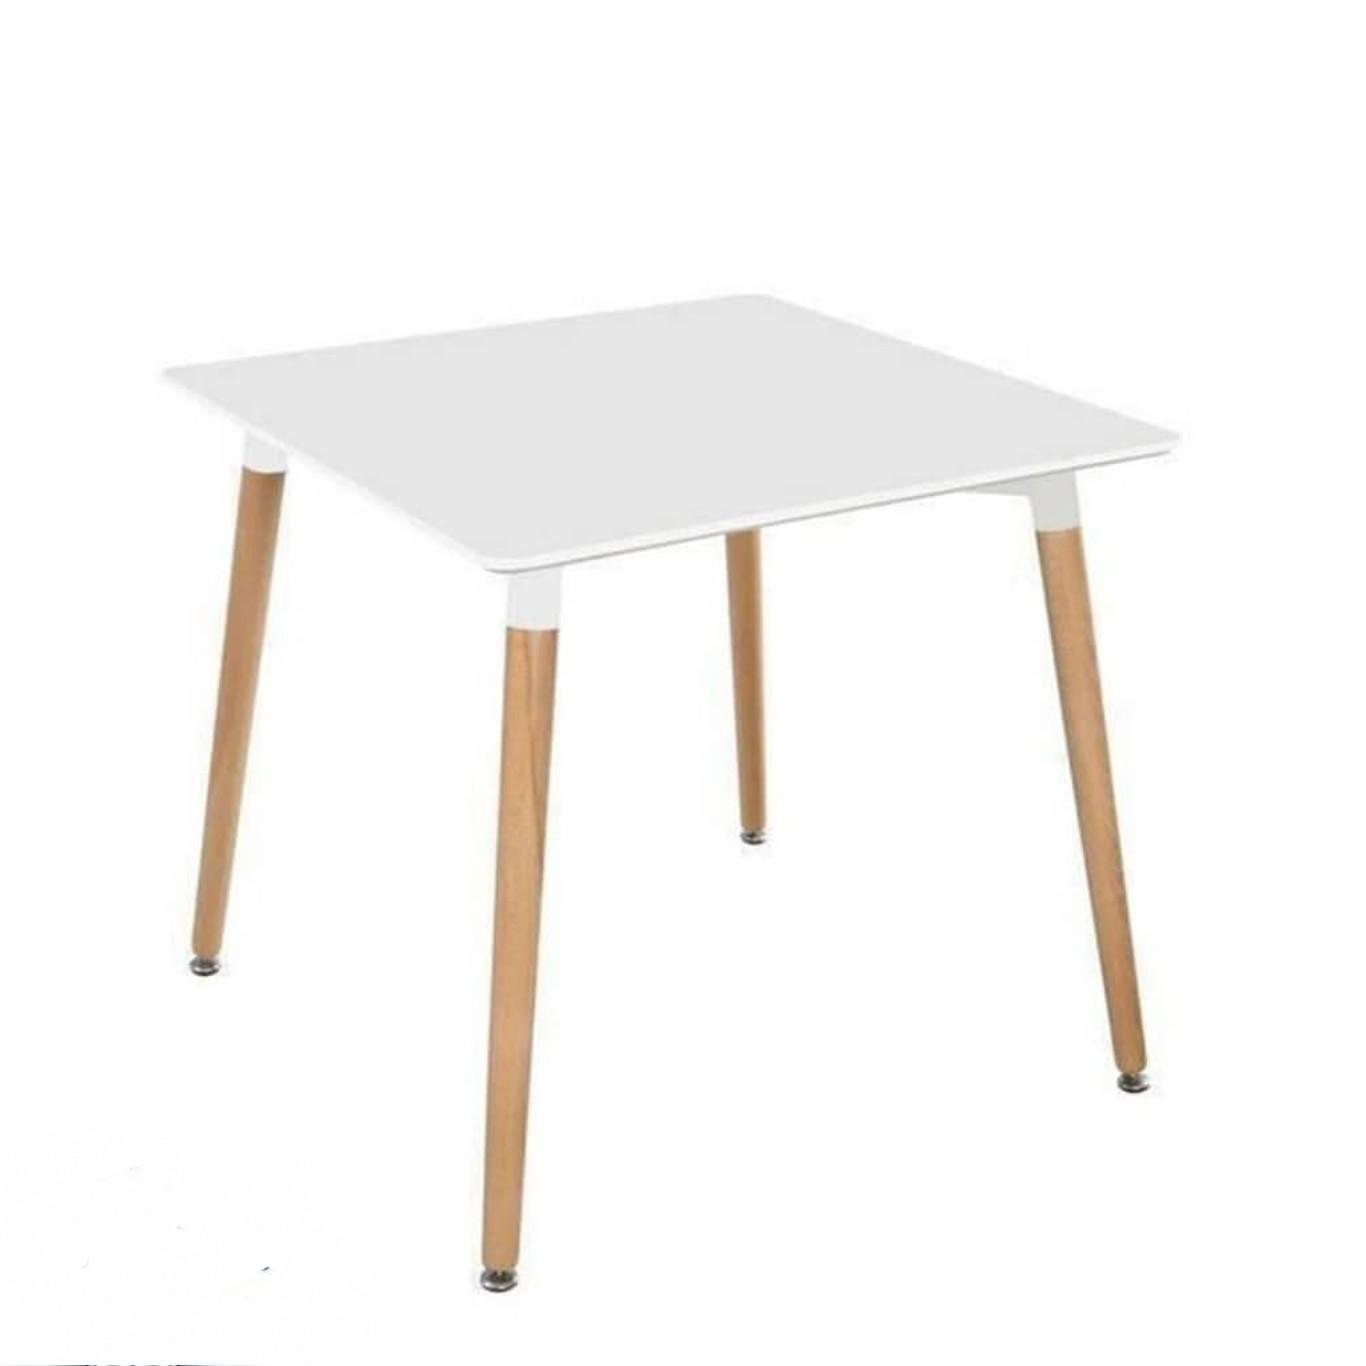 میز مربع پایه کنار 90*90